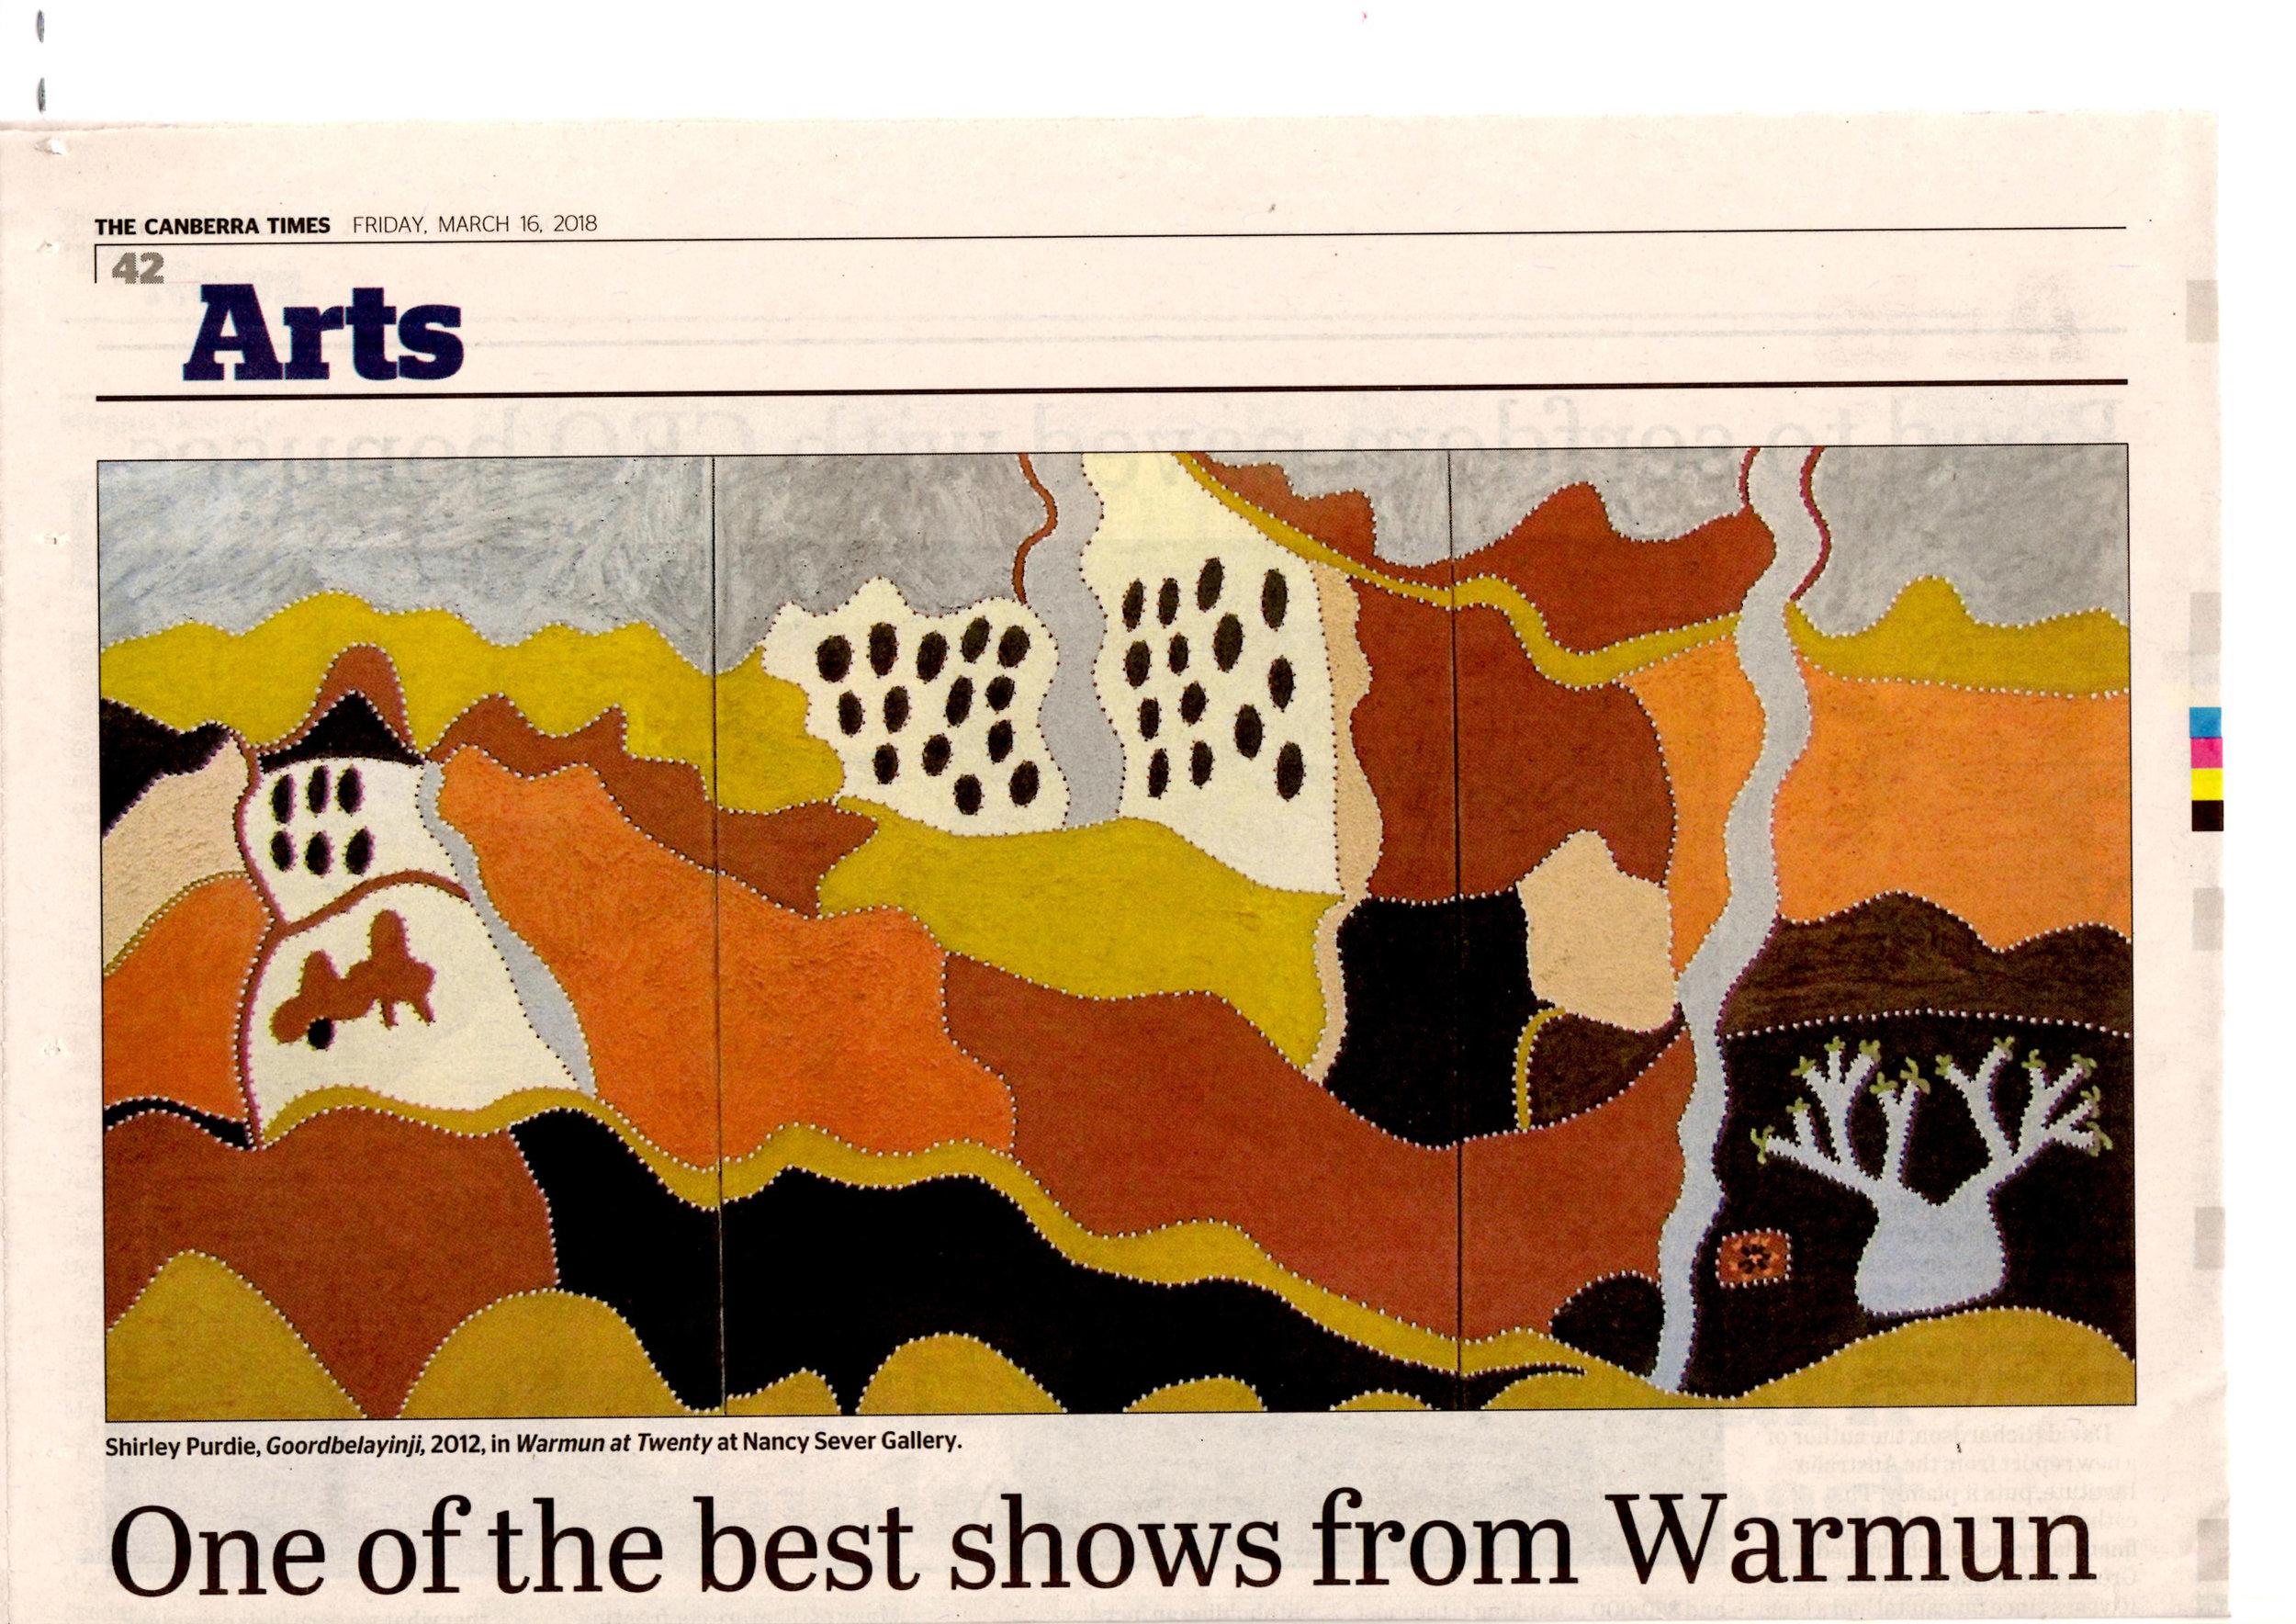 NSG.Warmun exhibition CT Review 16March2018p.1.jpg